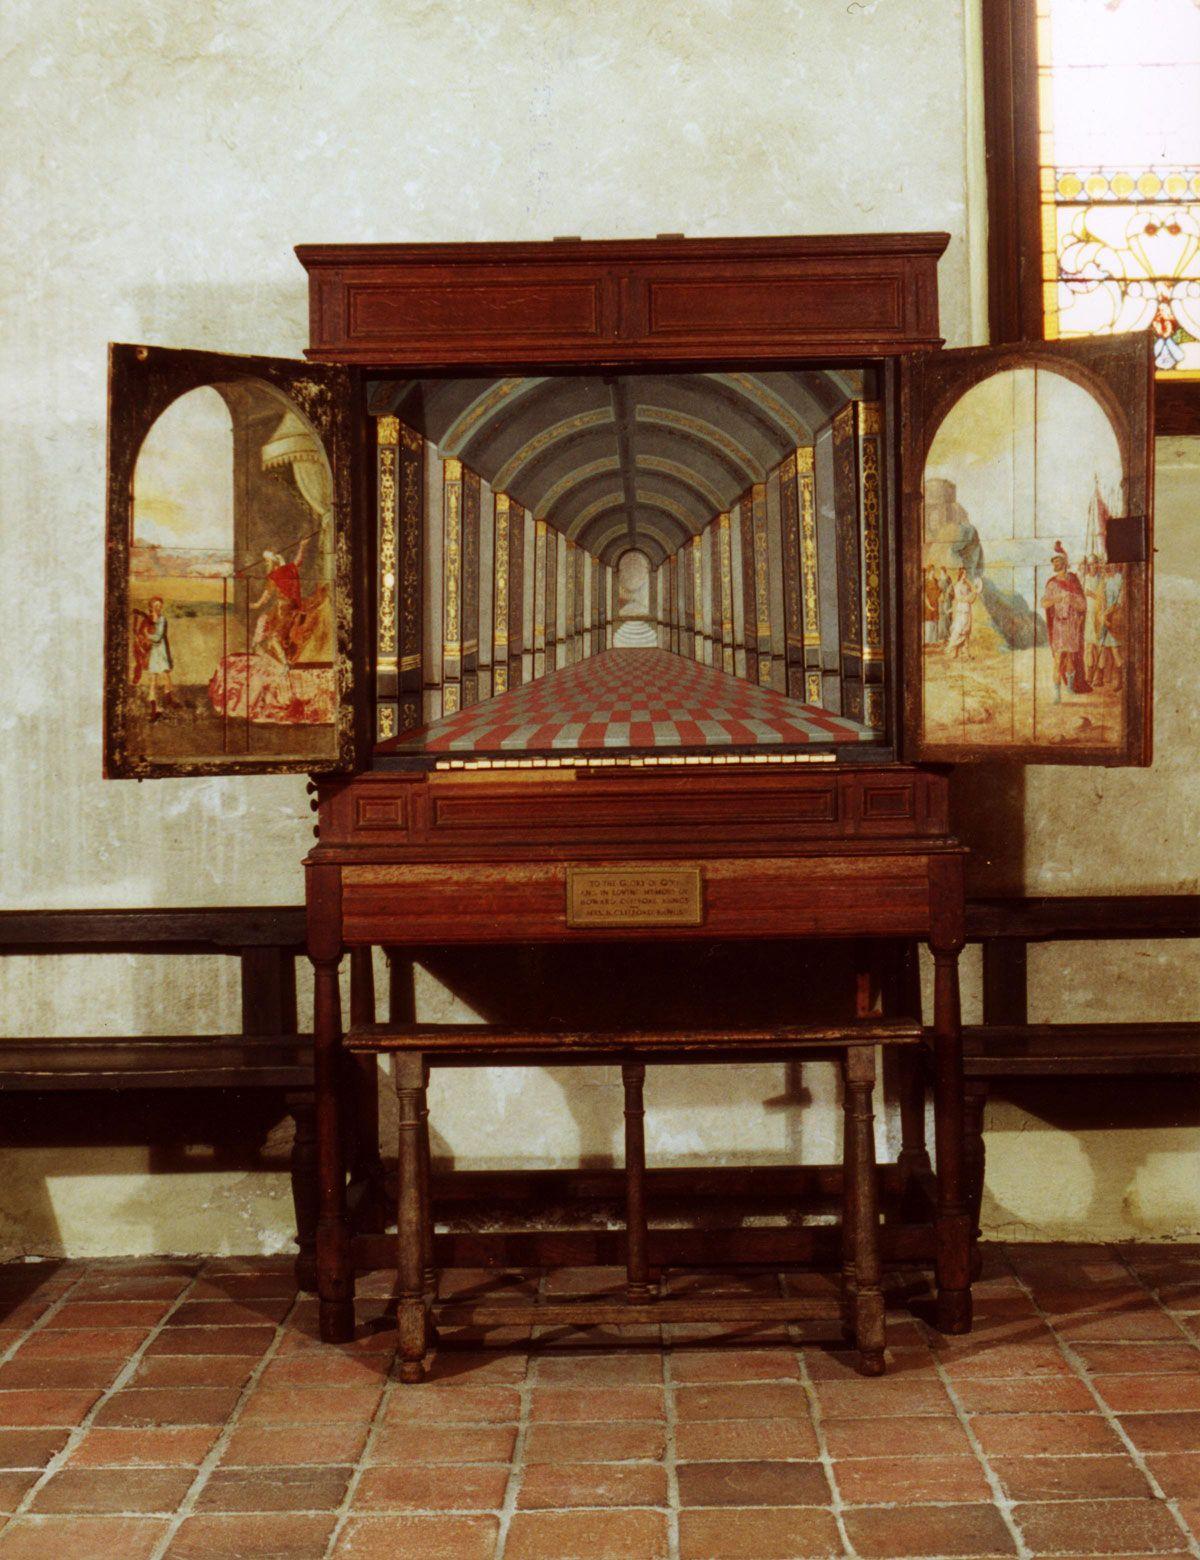 1630 ENGLISH CHAMBER ORGAN Organs, Smithfield virginia